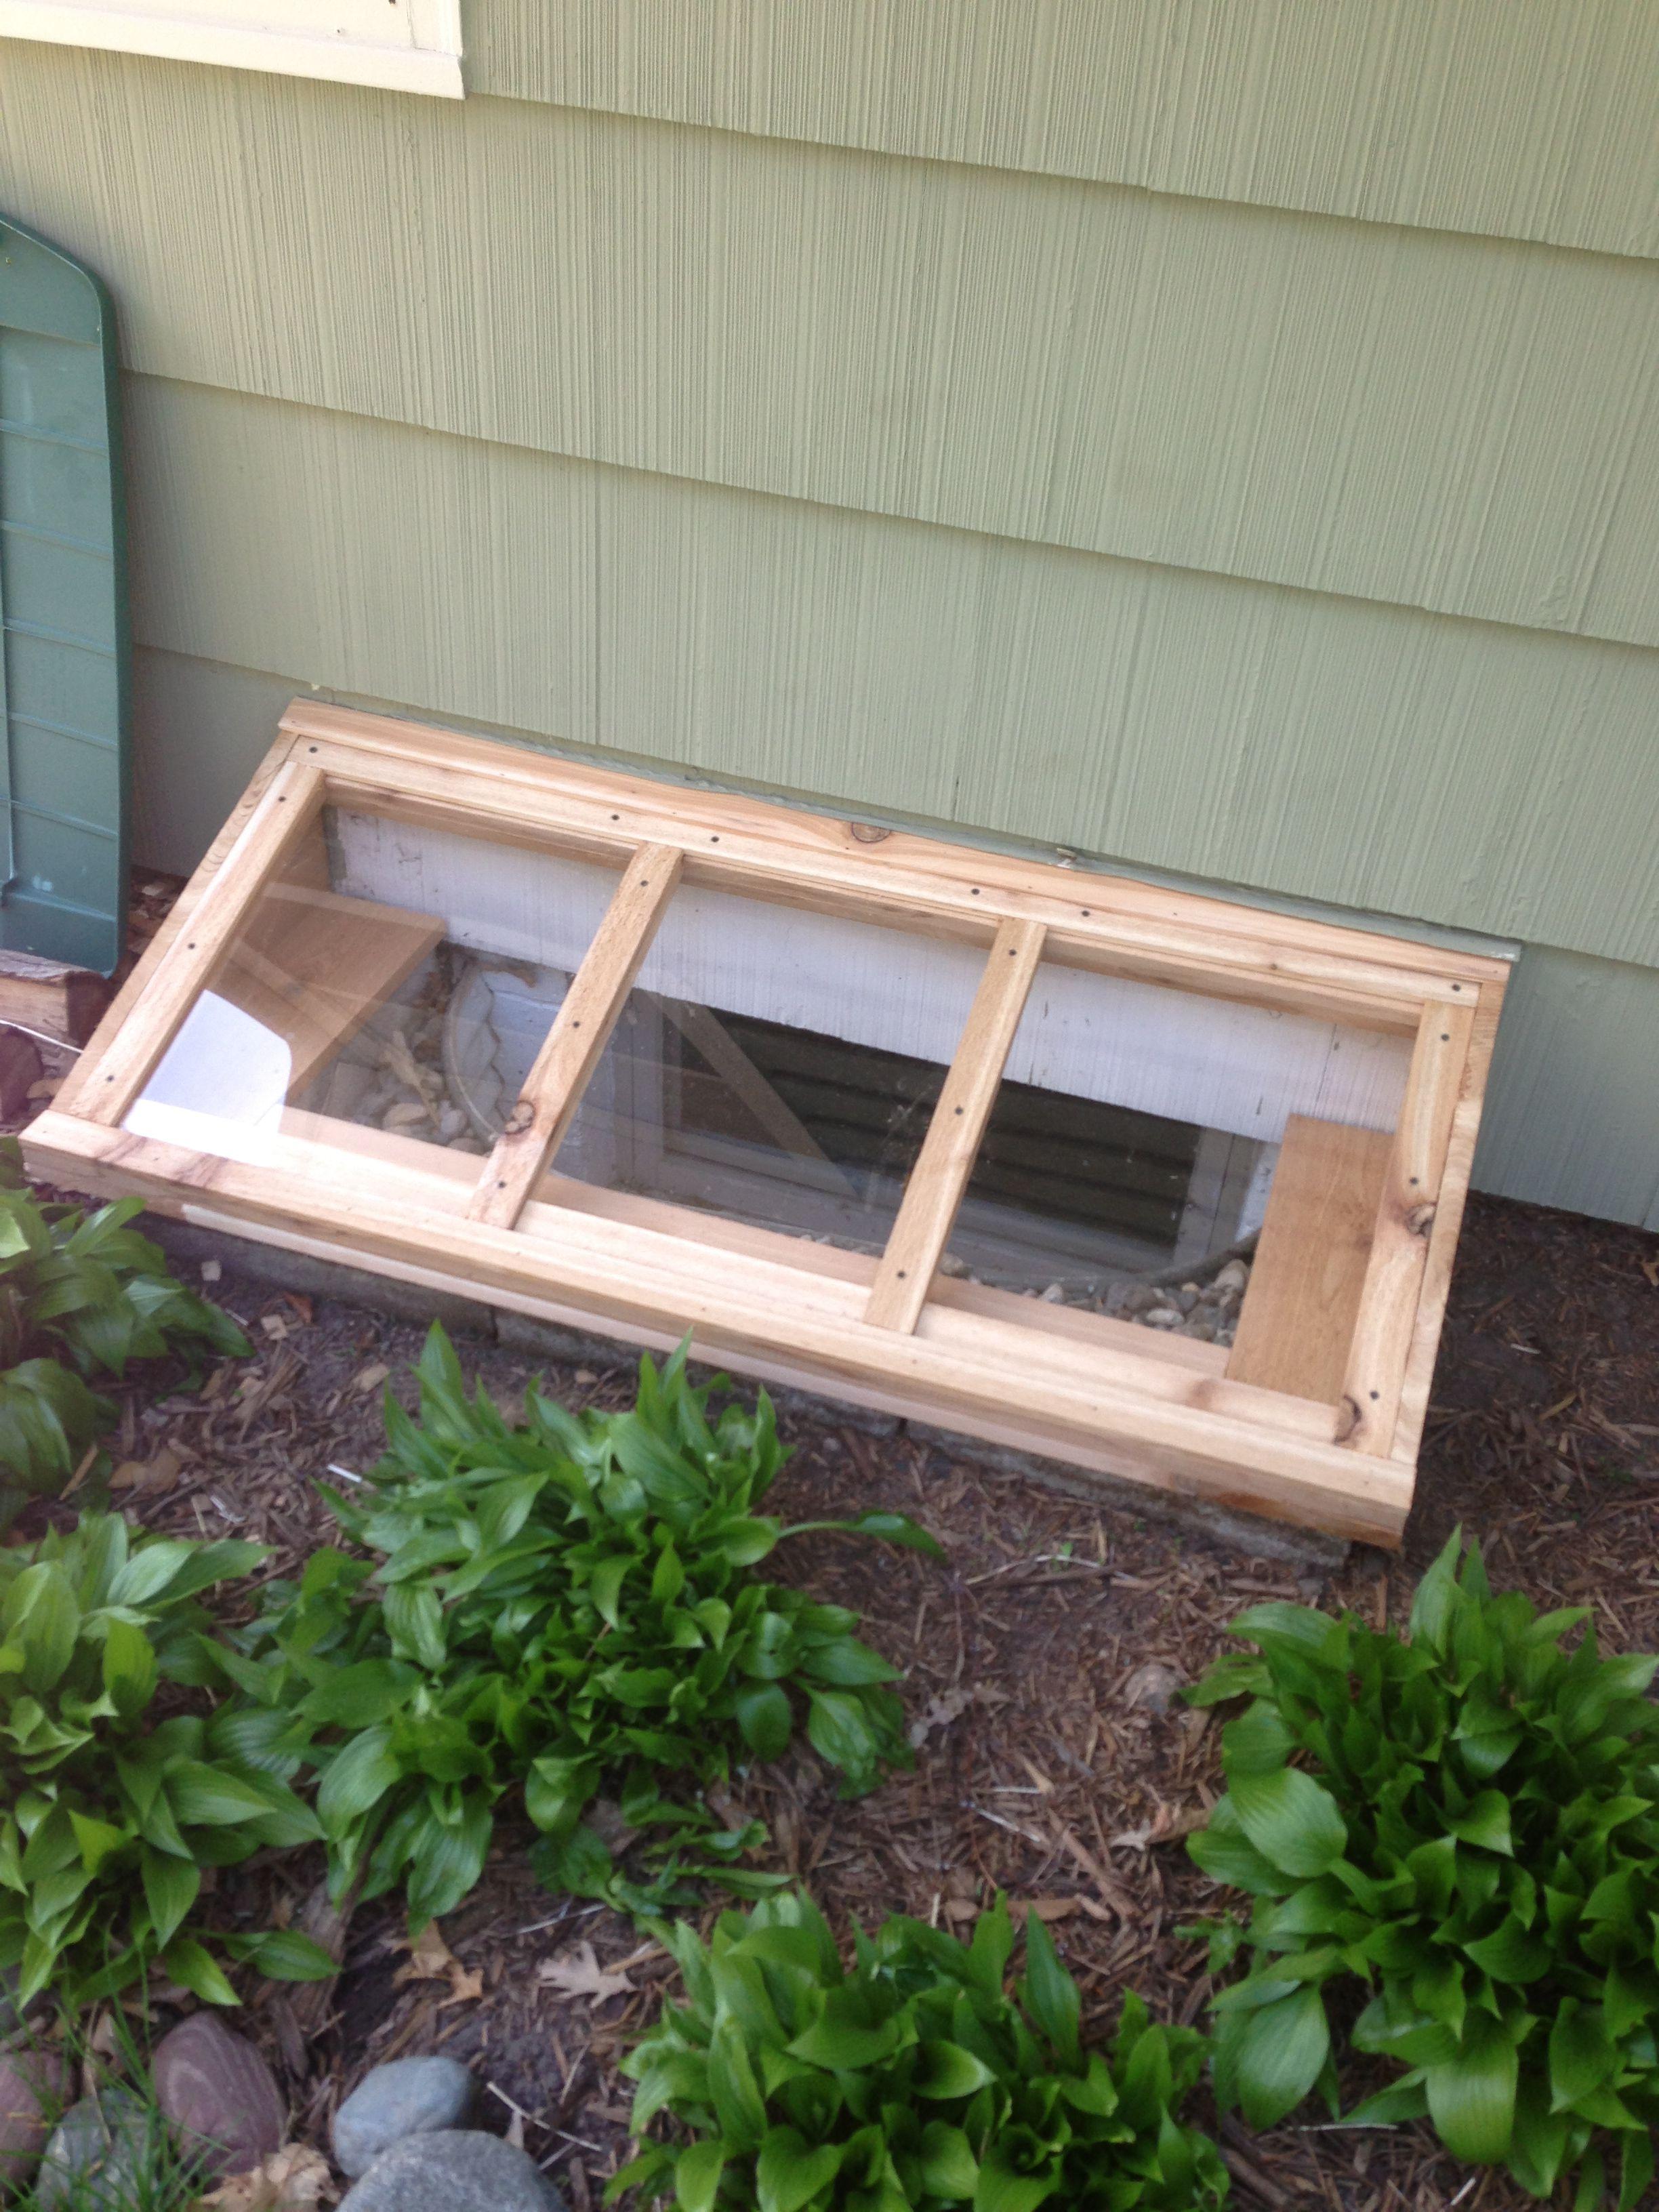 Affordable Egress Windows & Basement Waterproofing LLC 763 267